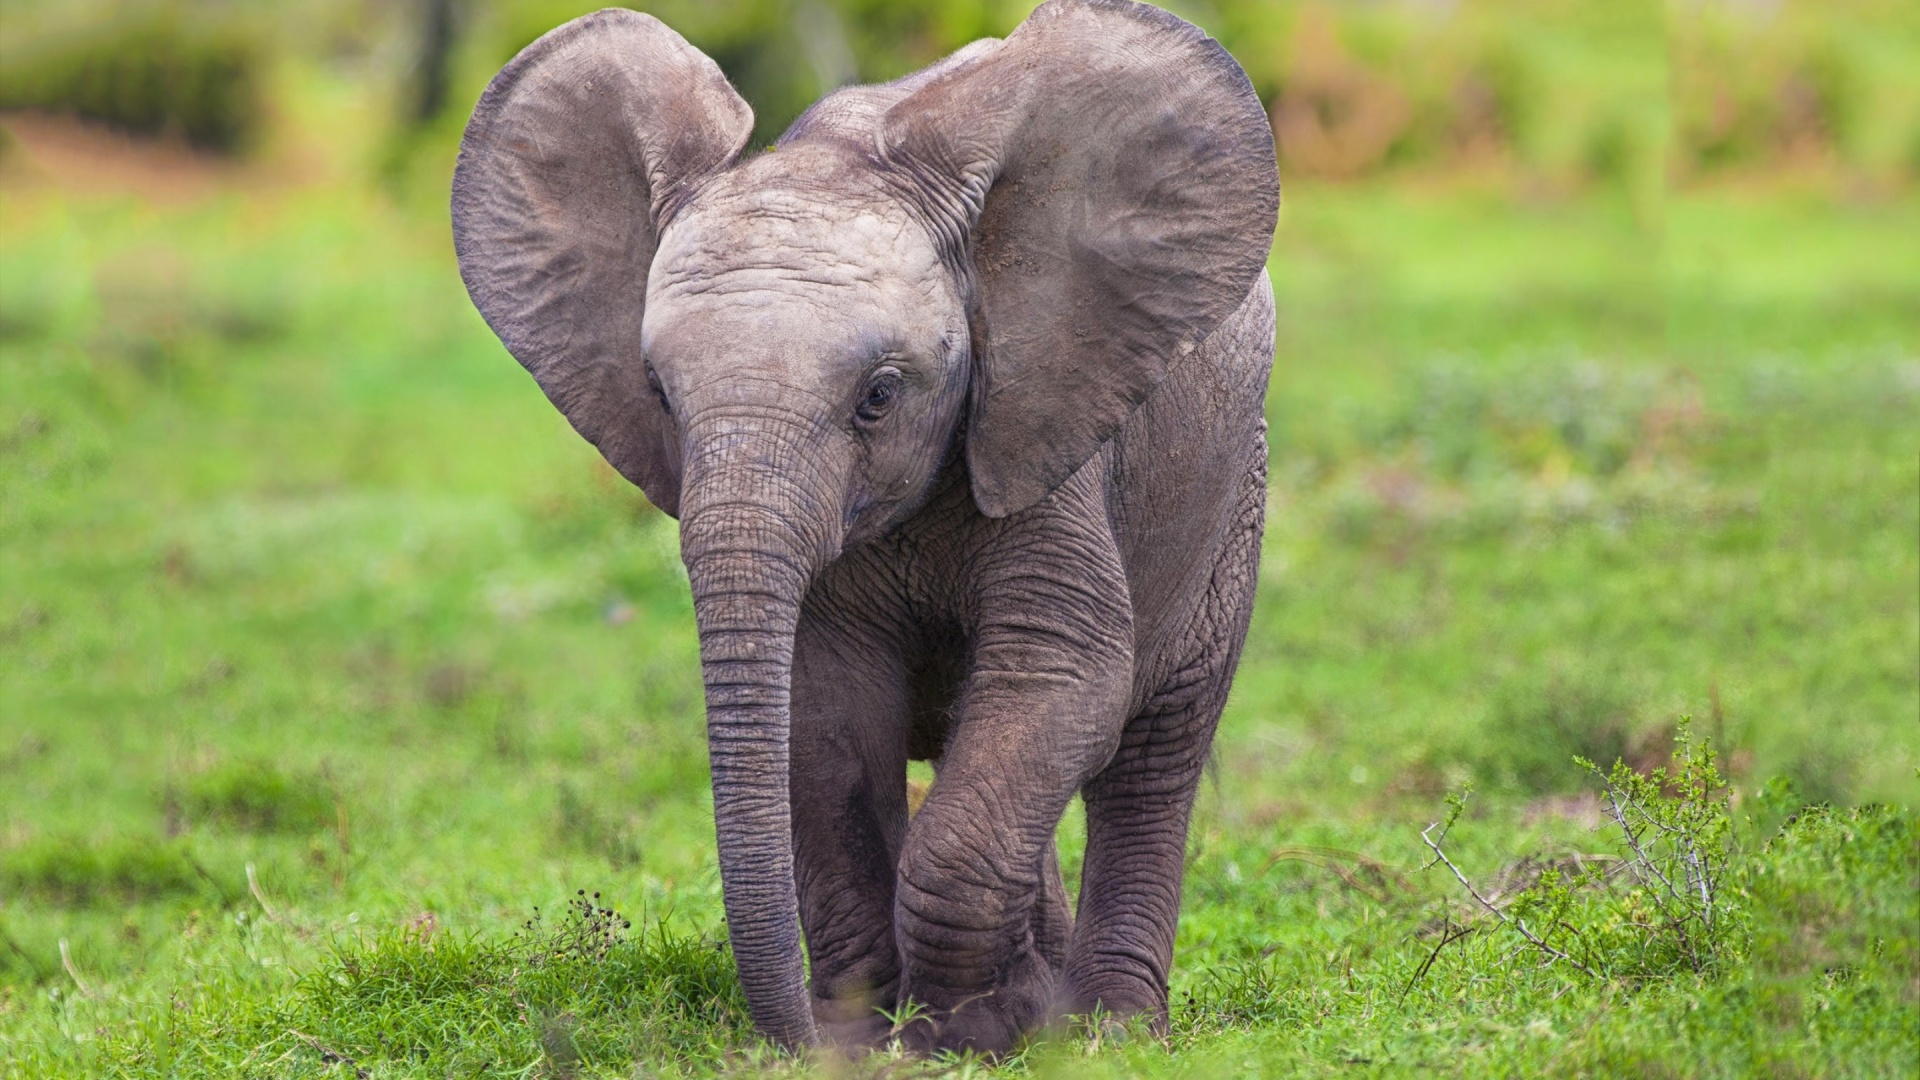 Baby elephant desktop wallpaper wallpapersafari - Fotos de elefantes bebes ...